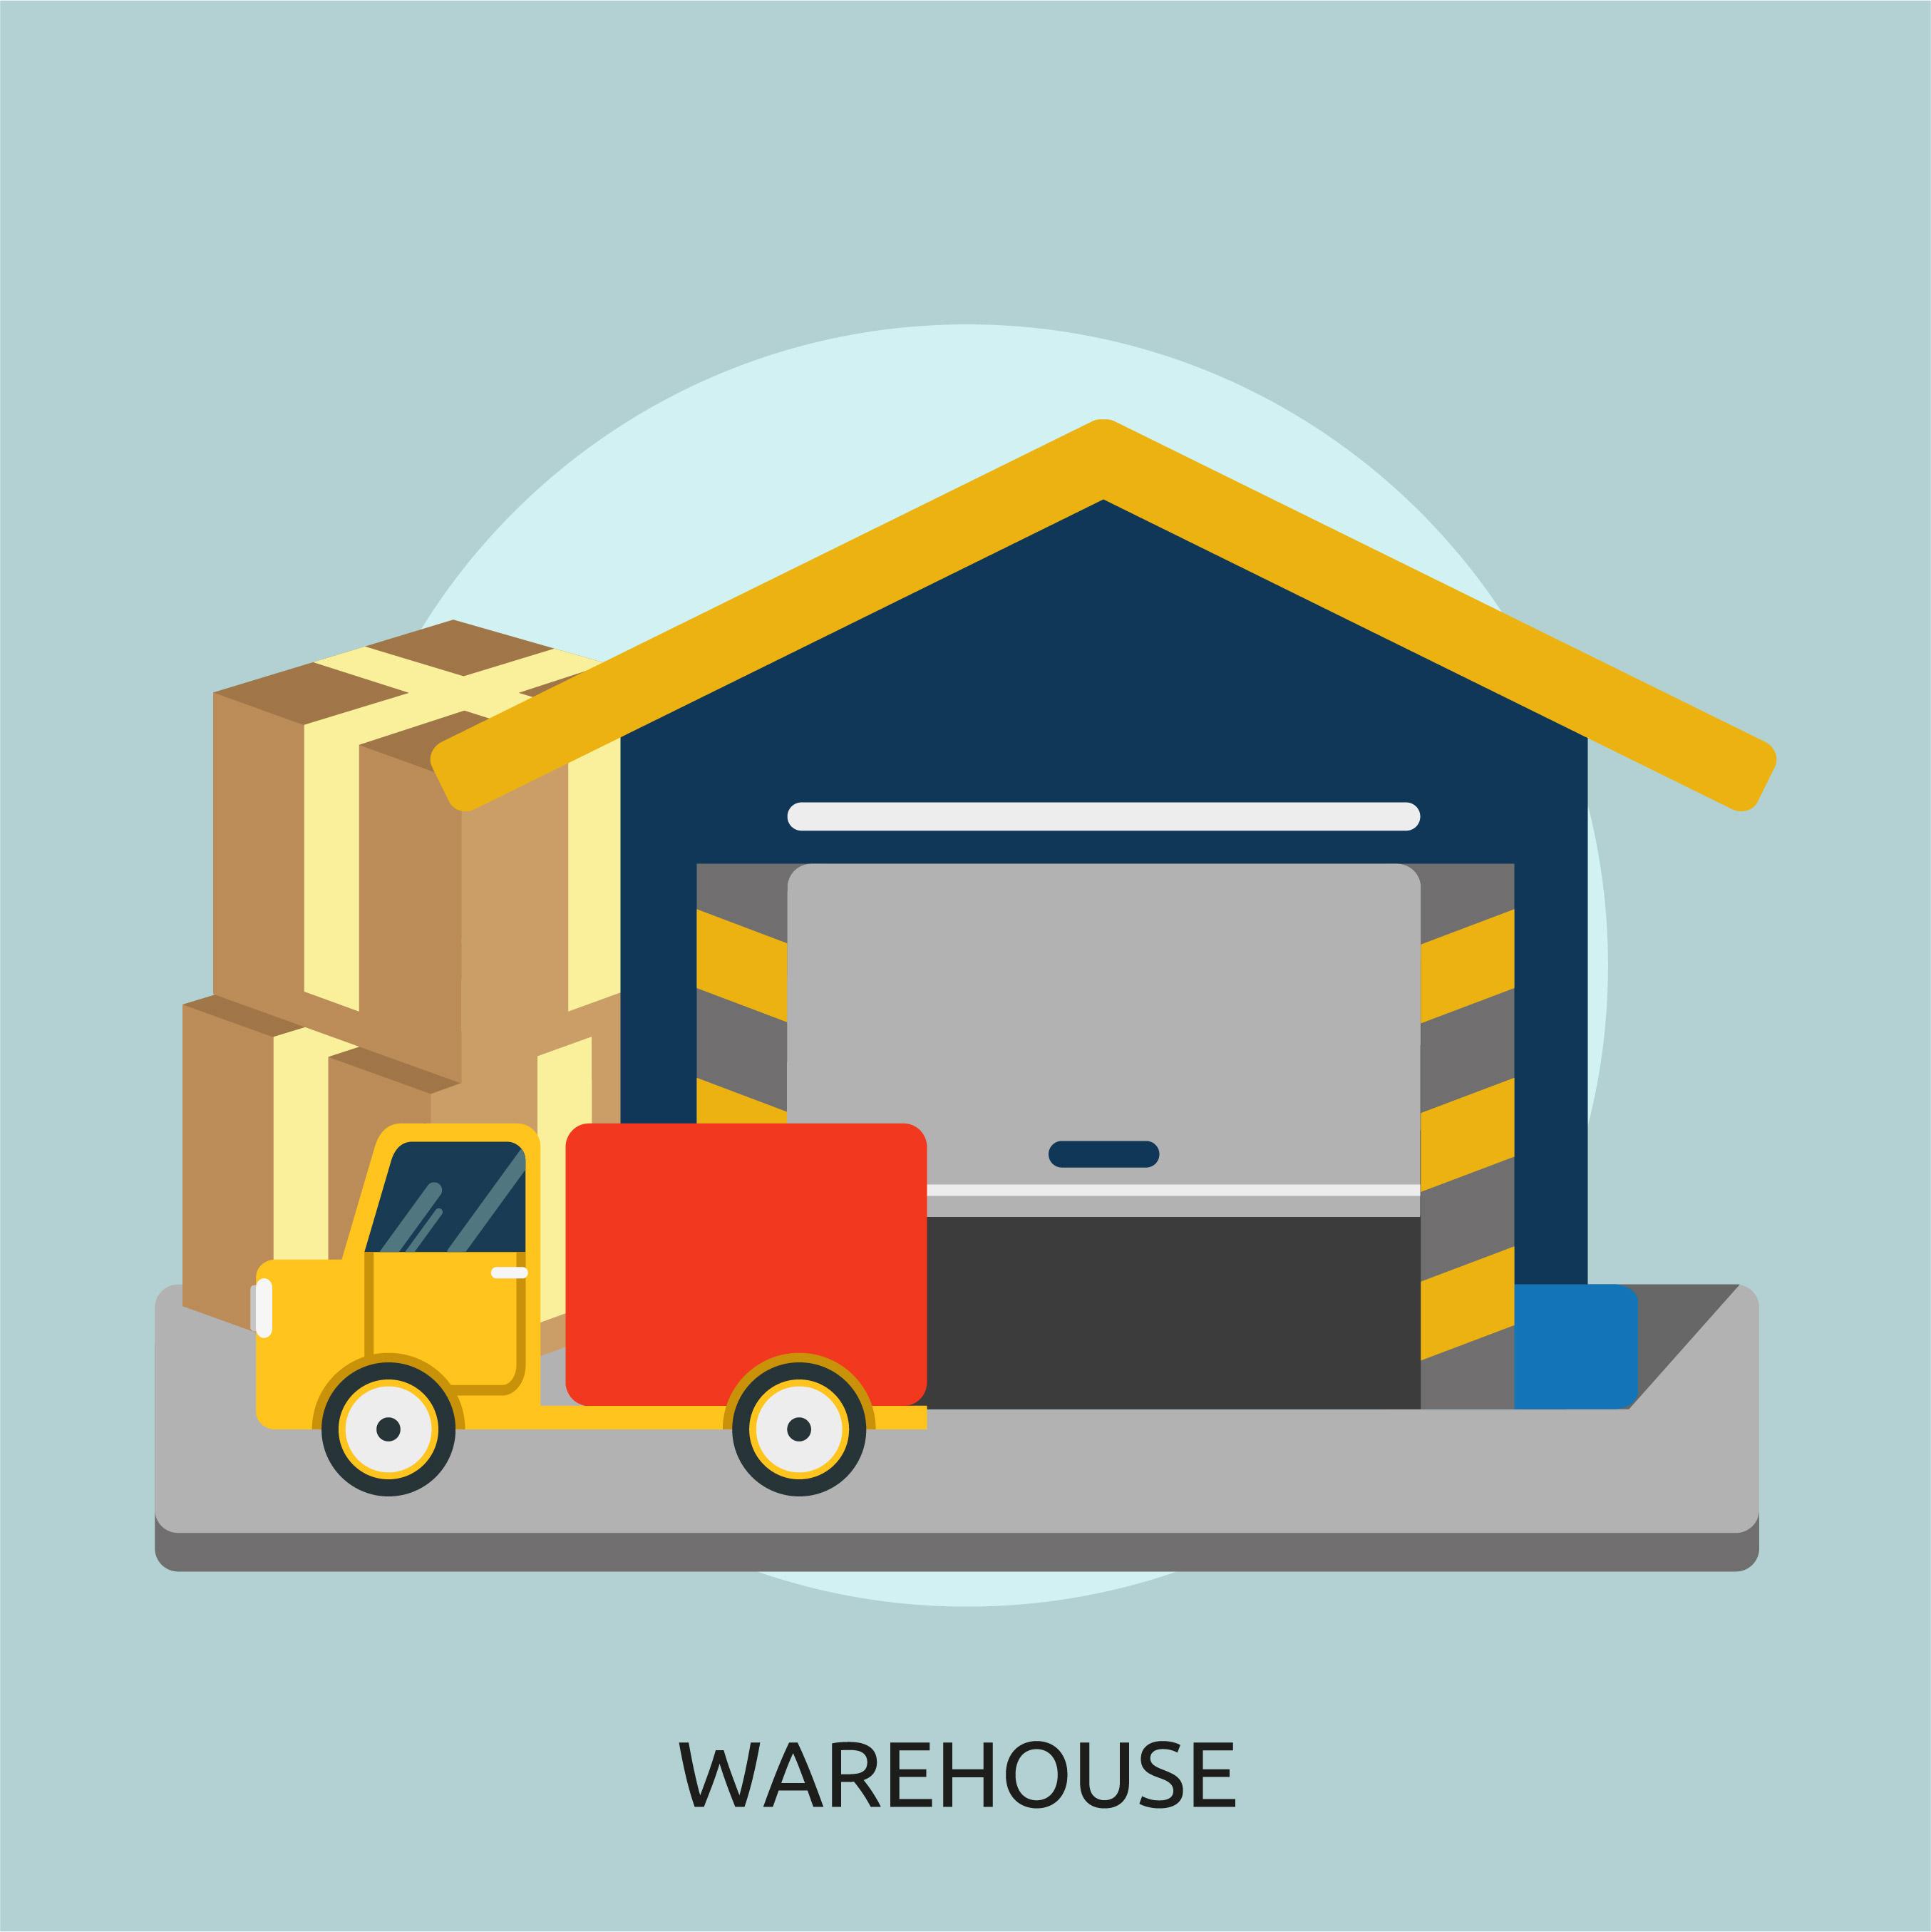 2709x2710 Warehouse Vector Image